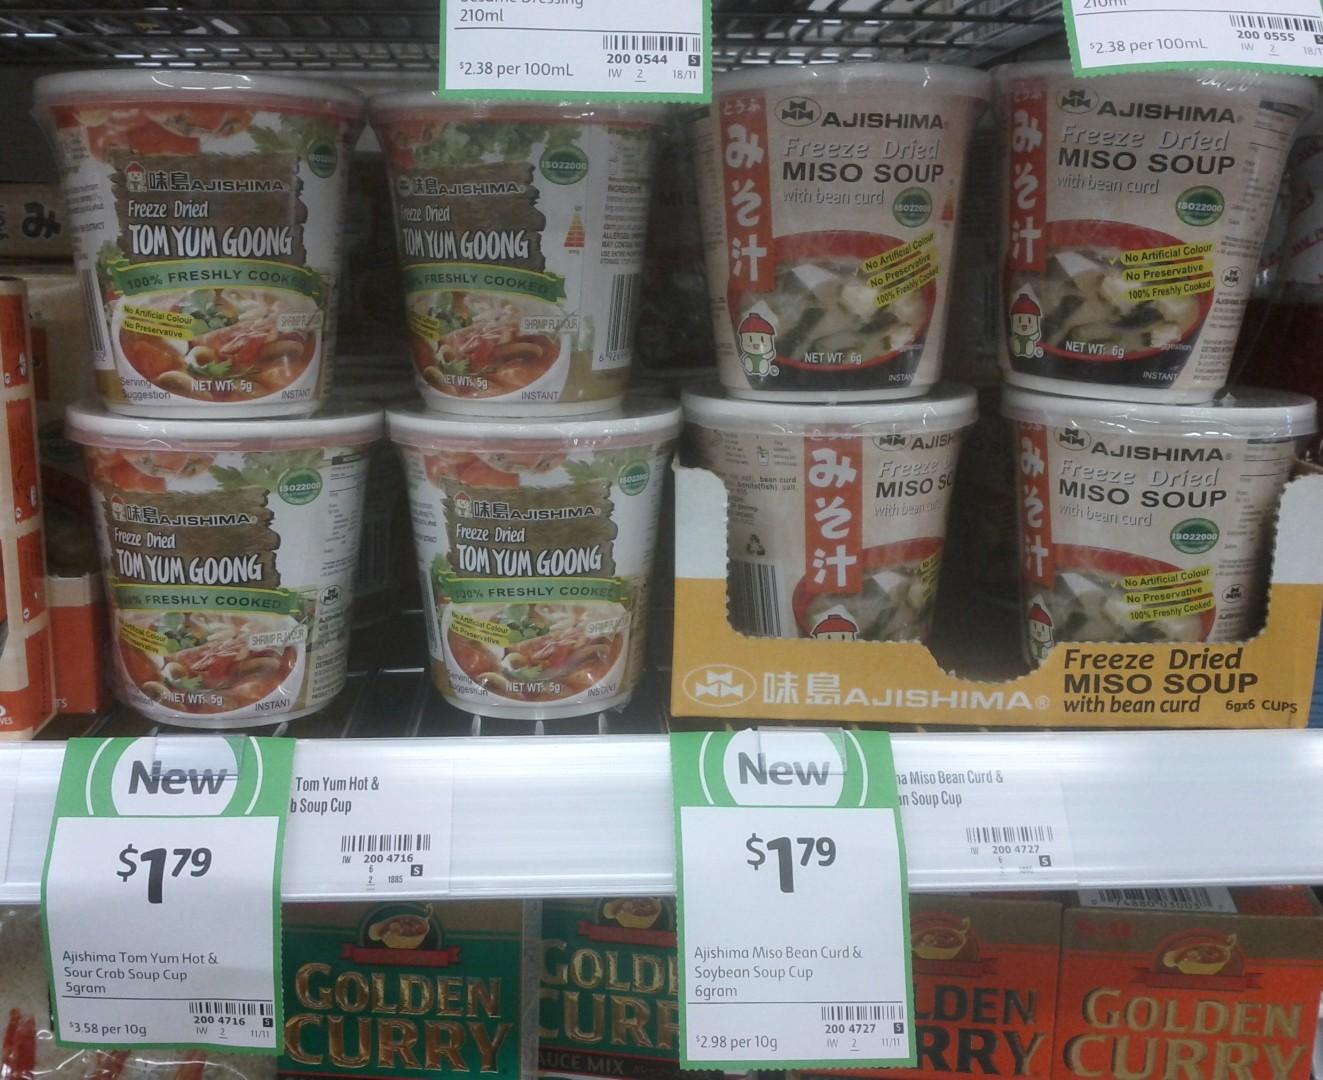 Ajishima 5g Sour Crab Soup Cup, 6g Miso Soup Bean Curd